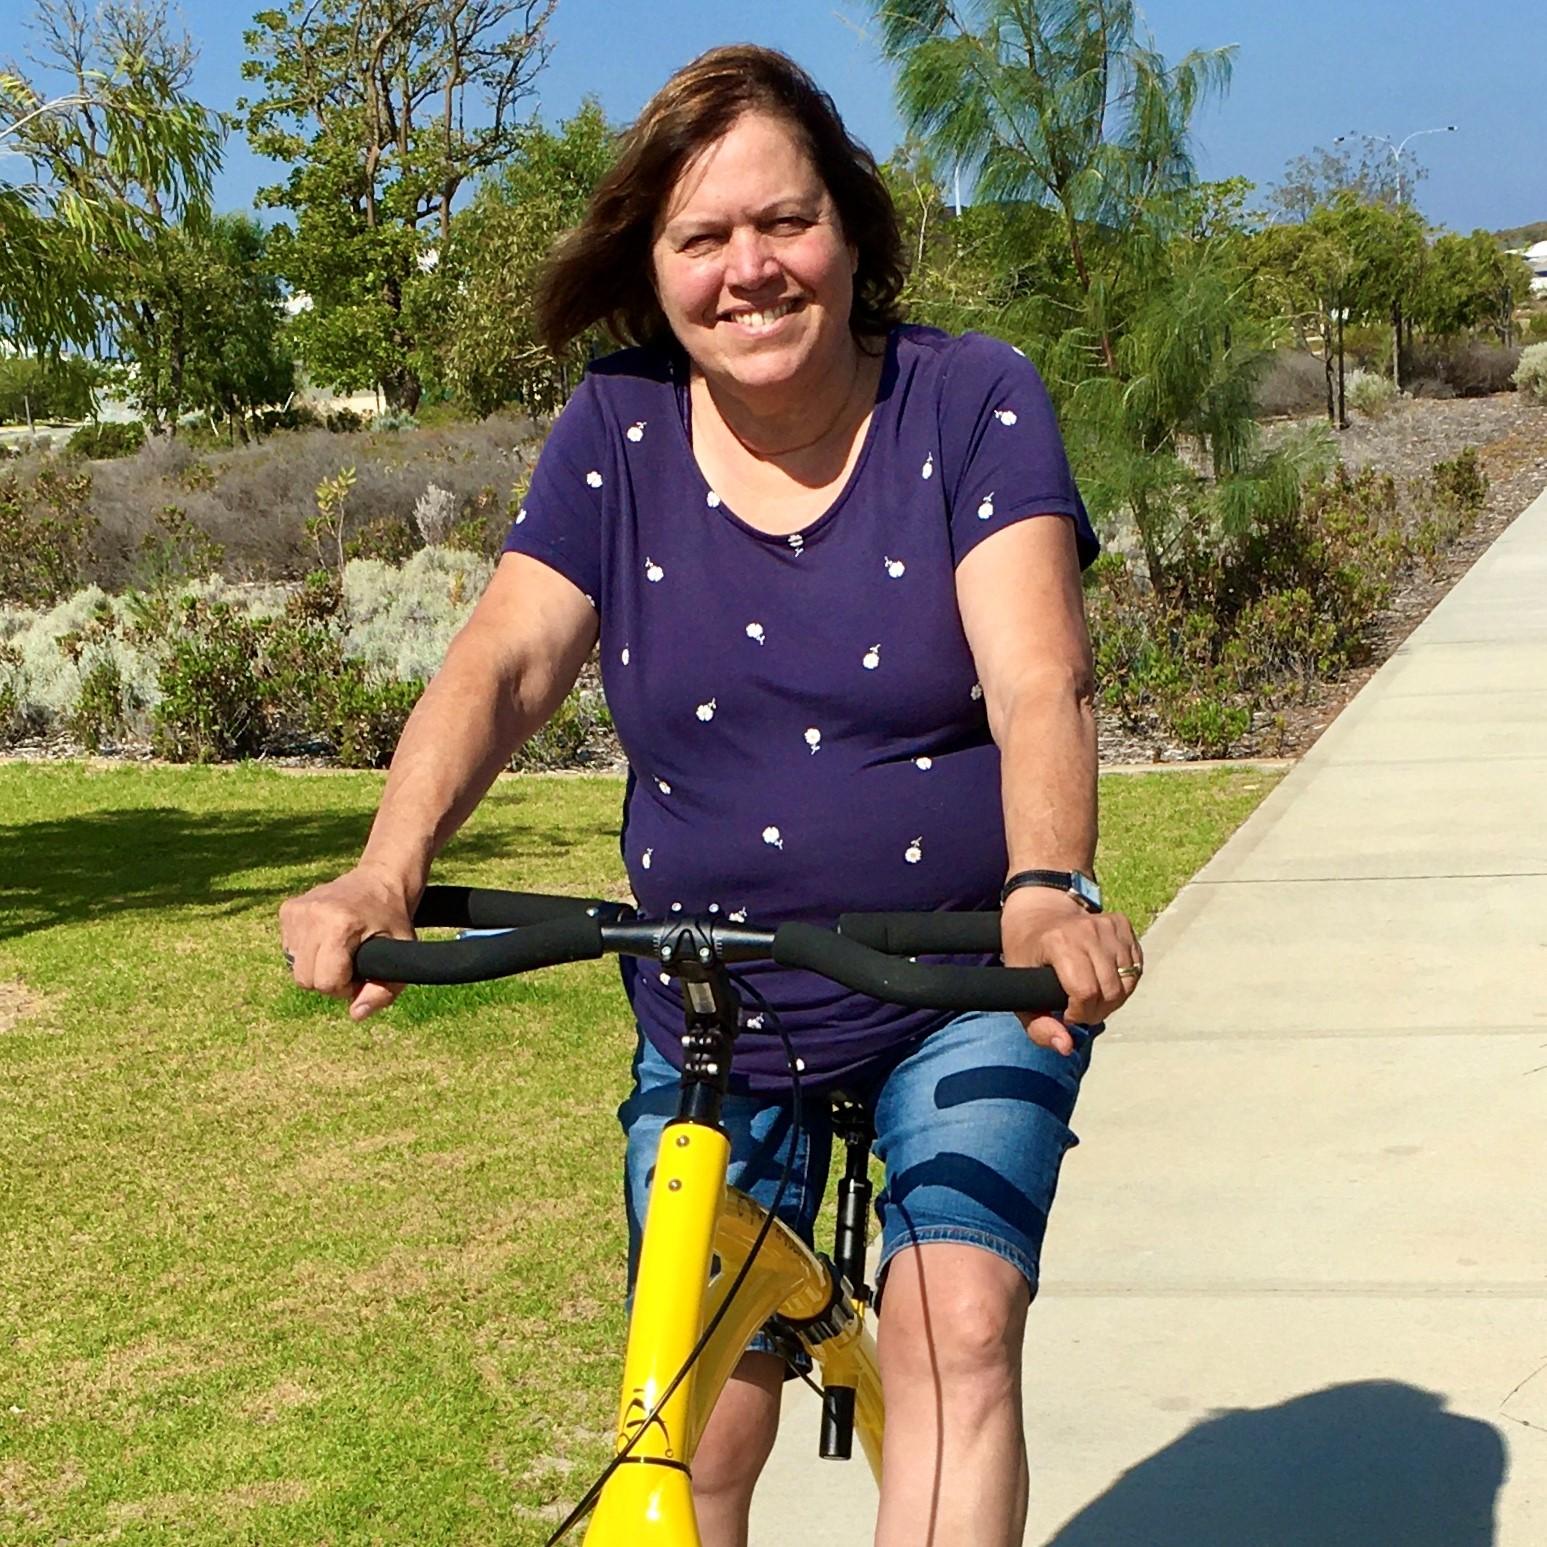 woman sits on yellow walking bike